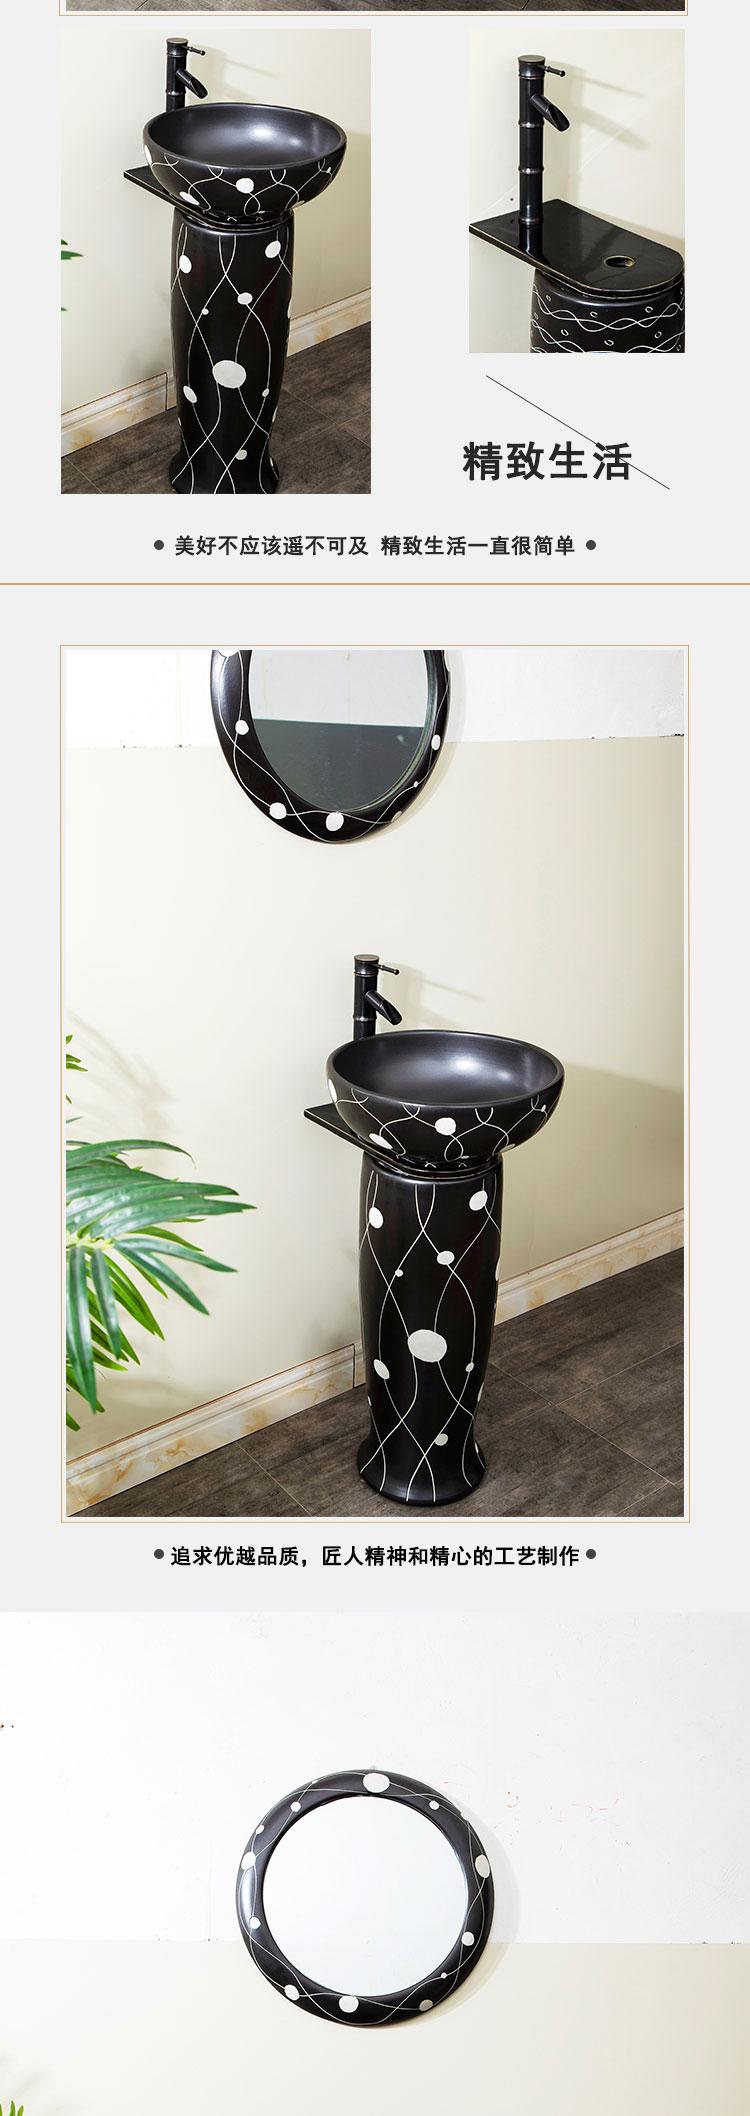 Ceramic column basin one pillar lavabo household toilet lavatory floor archaize sink the balcony